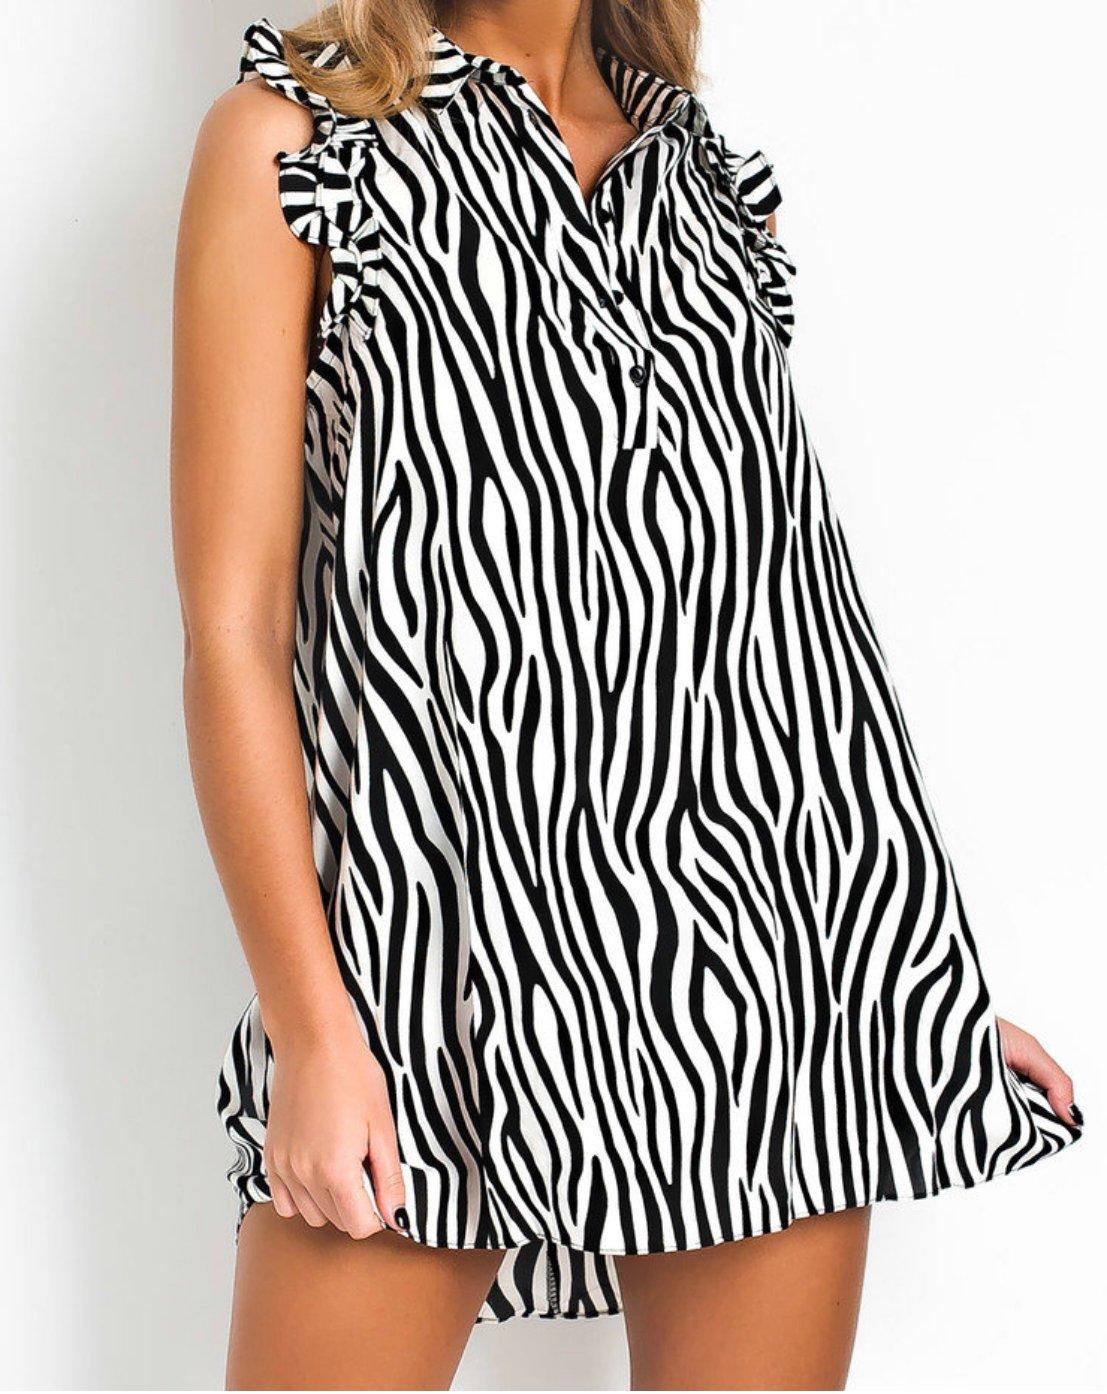 Image of print shirt dress